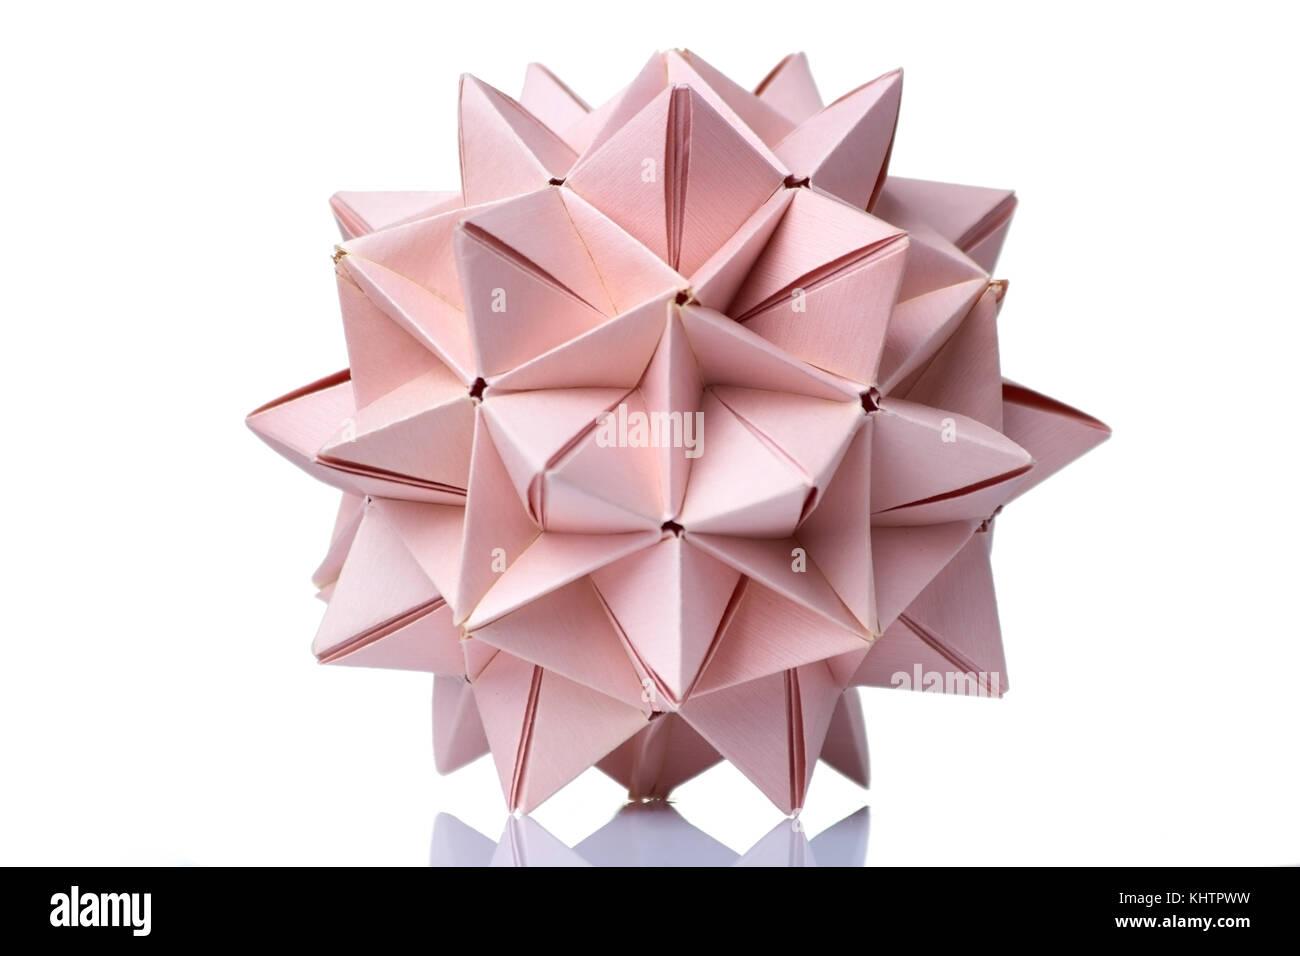 origami transforming spike ball showcase - YouTube   956x1300